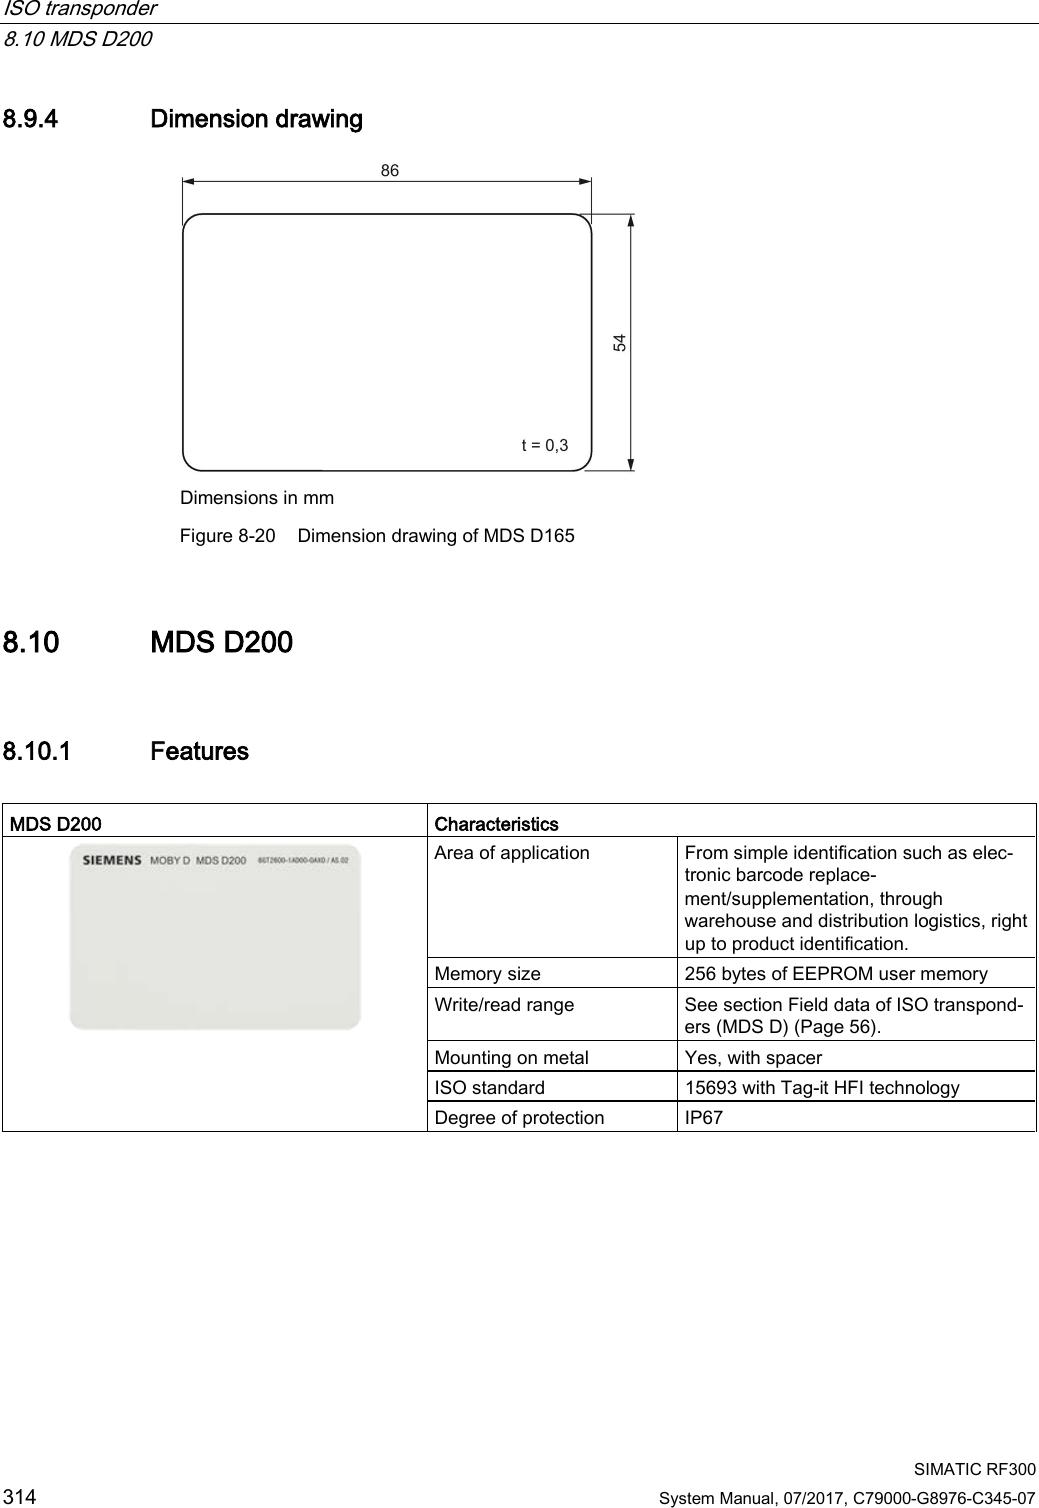 Siemens RF380R02 RFID Reader 13.56 MHz User Manual SIMATIC